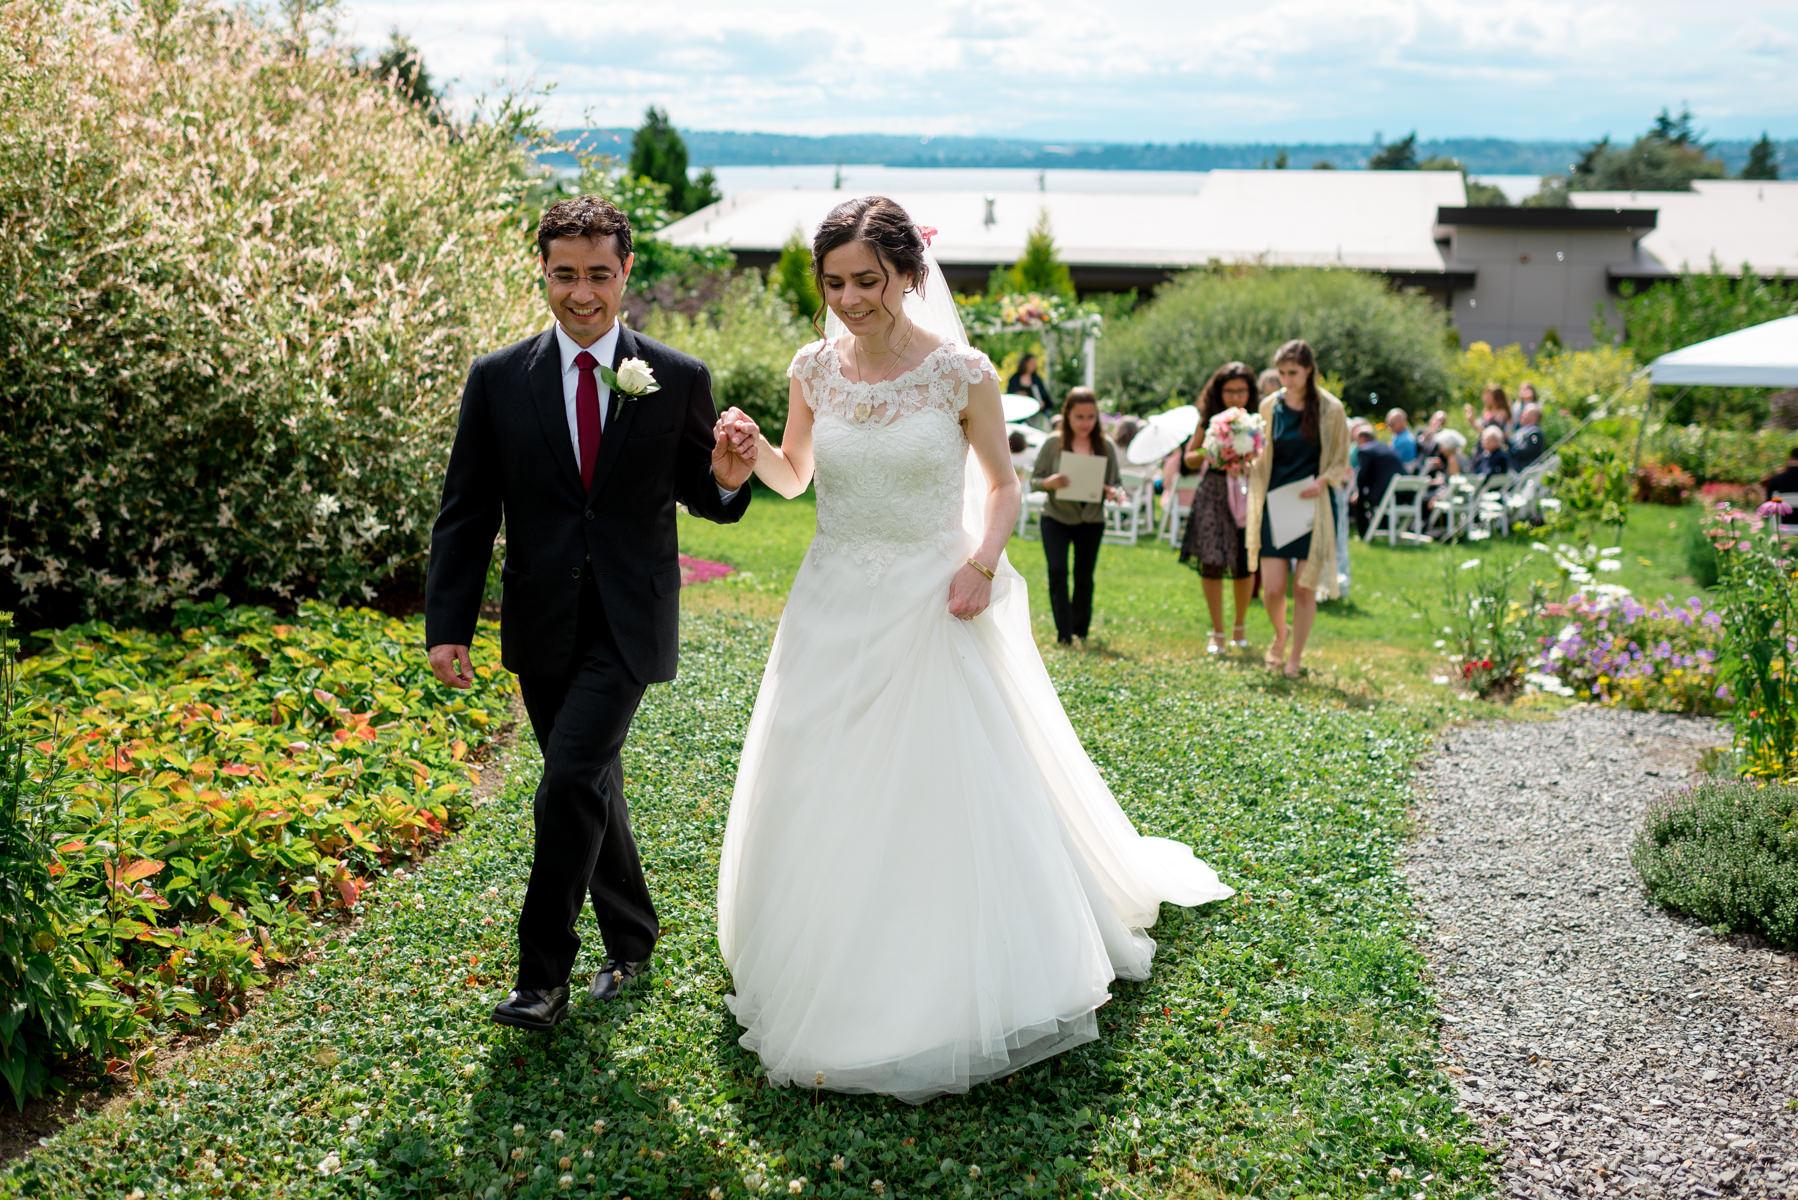 Andrew Tat - Documentary Wedding Photography - Kirkland, Washington - Emily & Cuauh - 20.JPG